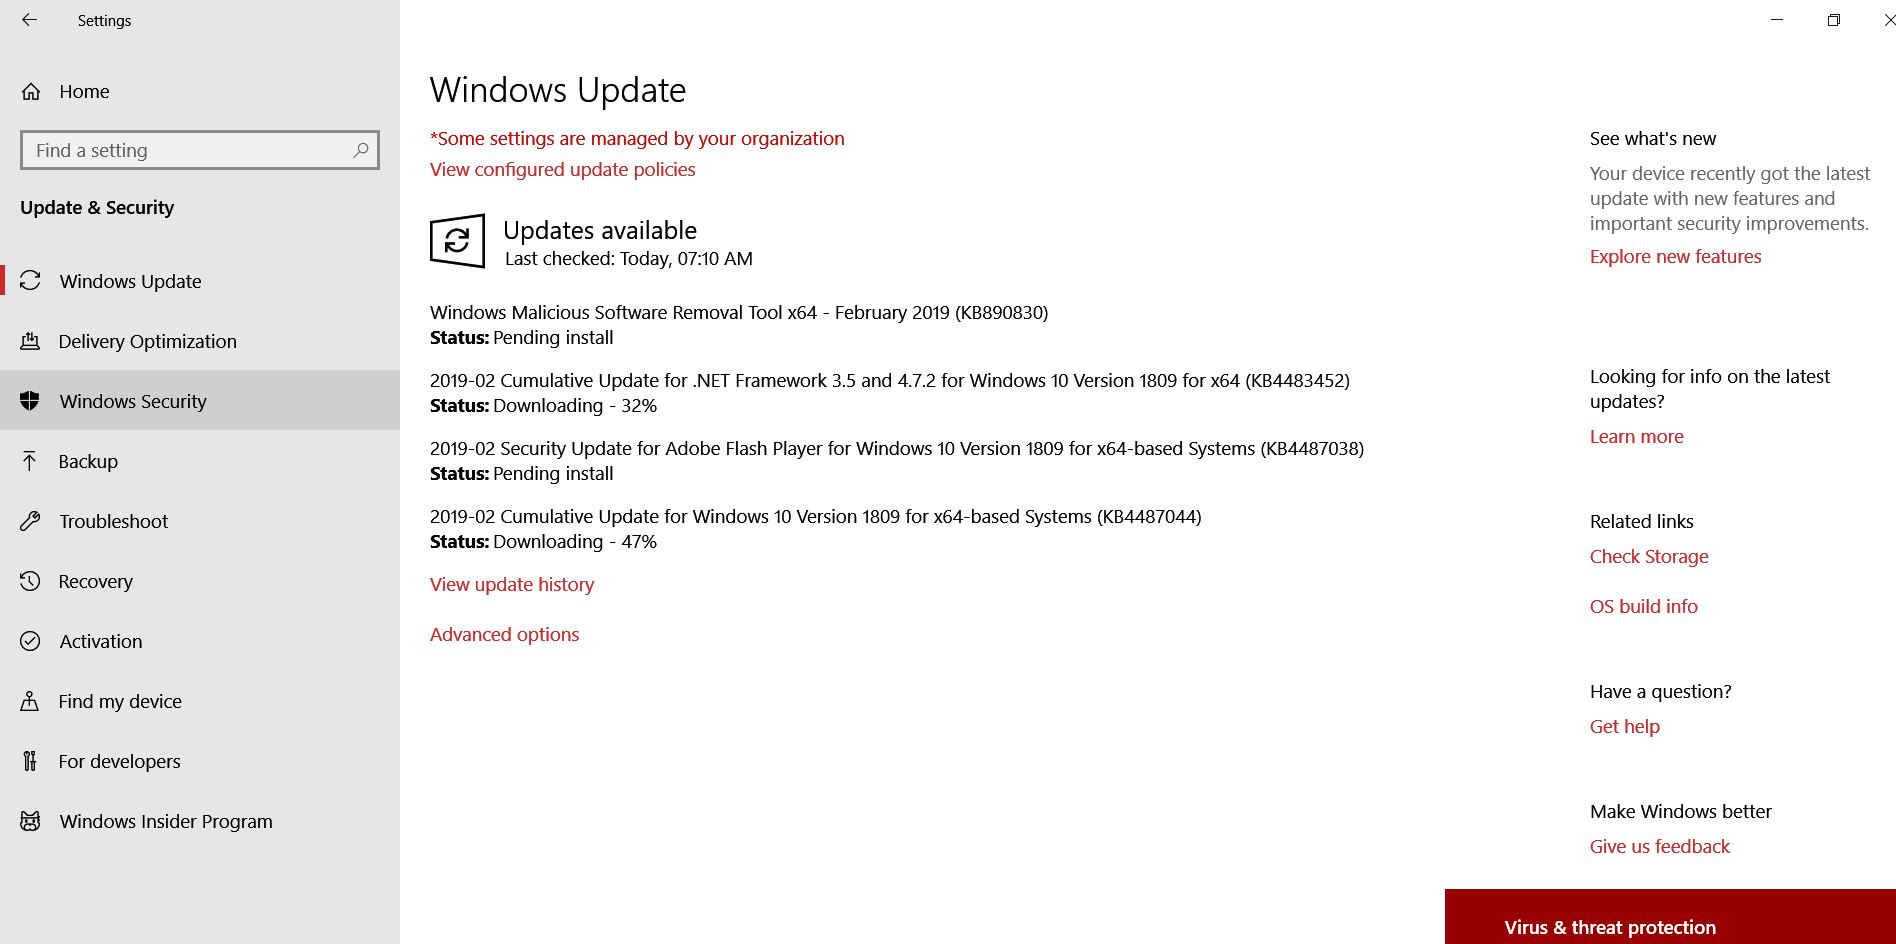 WINDOWS UPDATE RELEASED CLU KB4489899 TO WINDOWS 10 1809 AND WINDOWS SERVER 2019 ON 12-03-2019 904cbe68-4cf6-4fdd-9fd5-7c67dff4cc98?upload=true.jpg